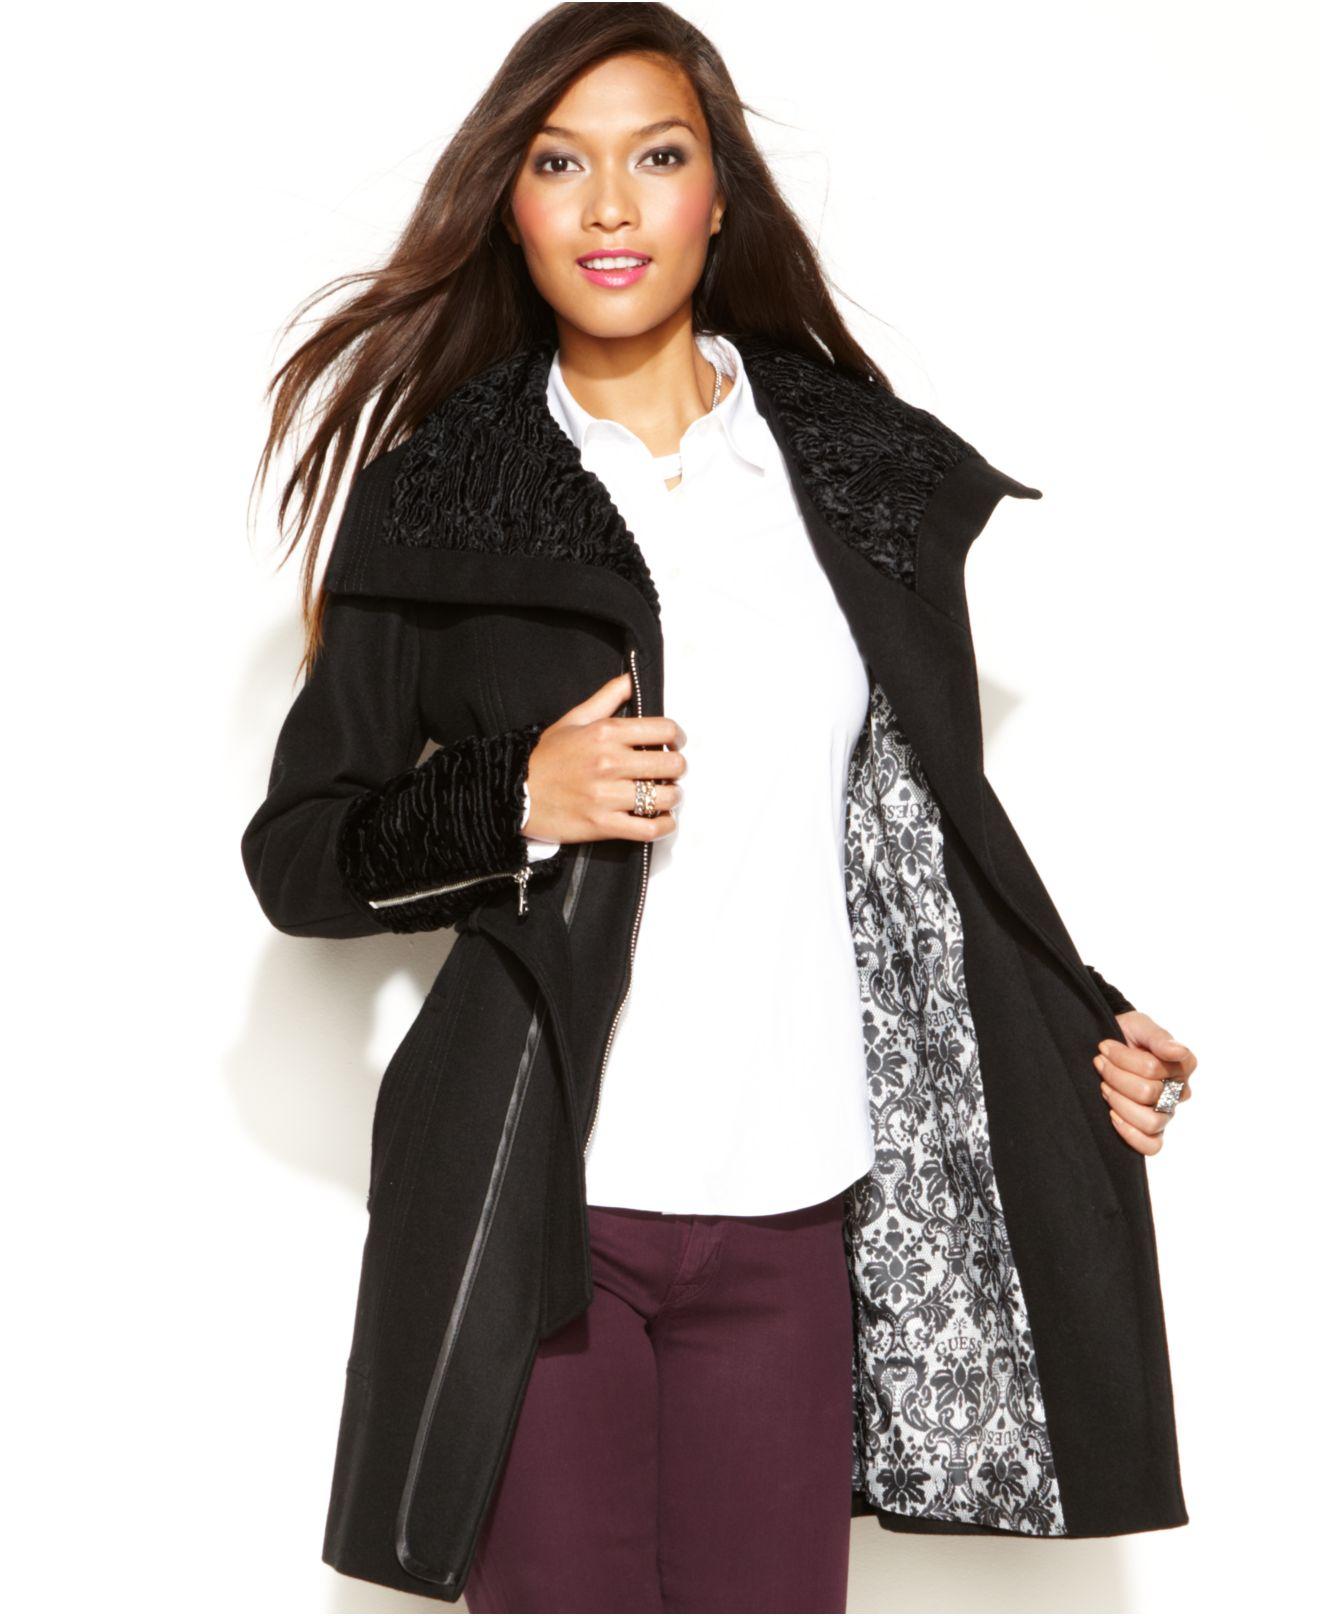 Guess Wool-Blend Faux-Fur-Trim Belted Coat in Black | Lyst